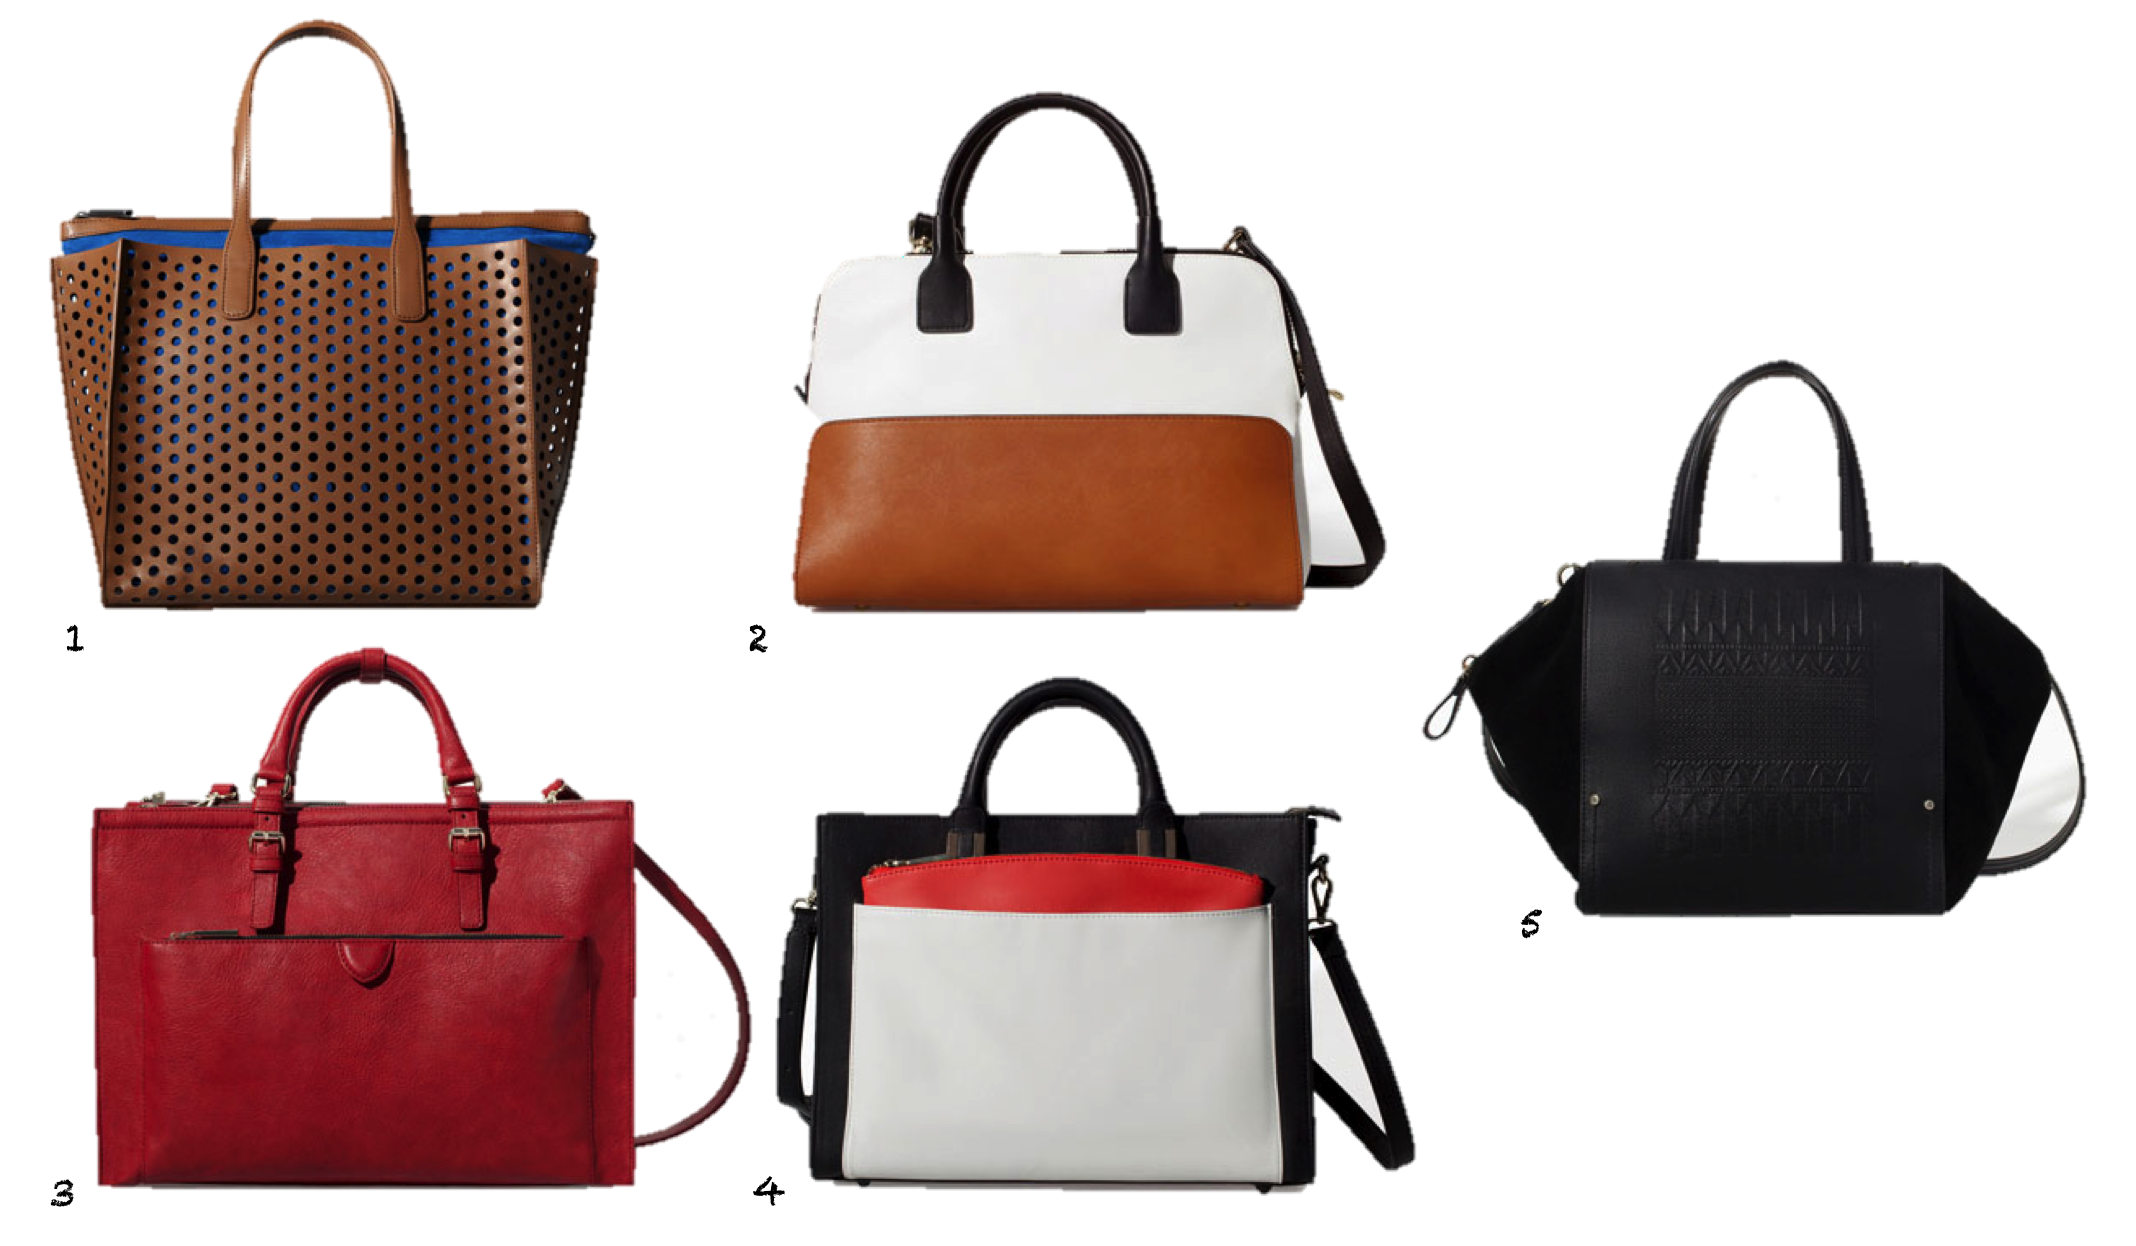 Zara Perforated Shopper Bag Perforated Shopper Bag